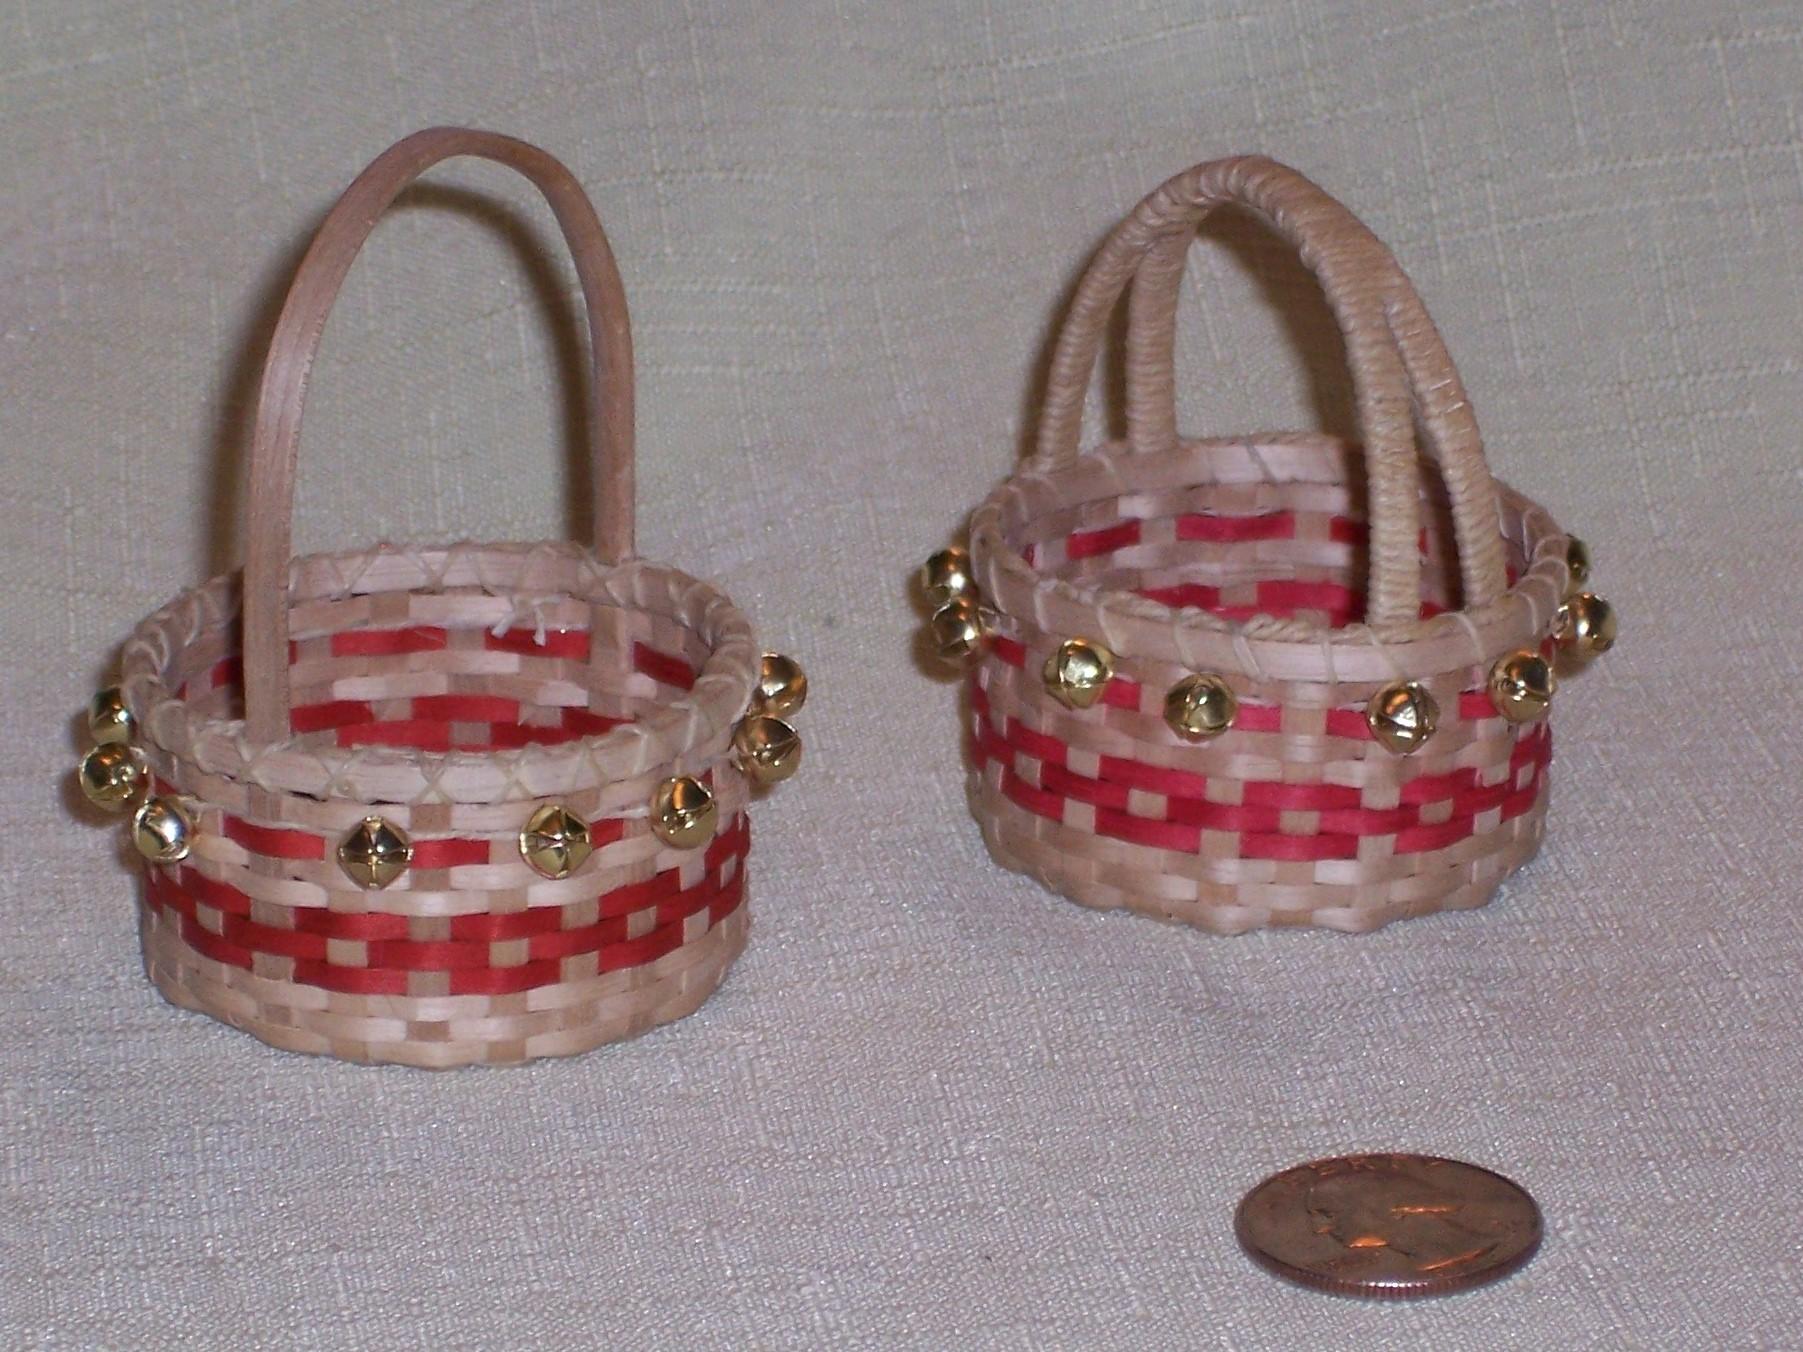 Basket Weaving Ornaments : Christmas basket and woven ornaments prairiewood basketry